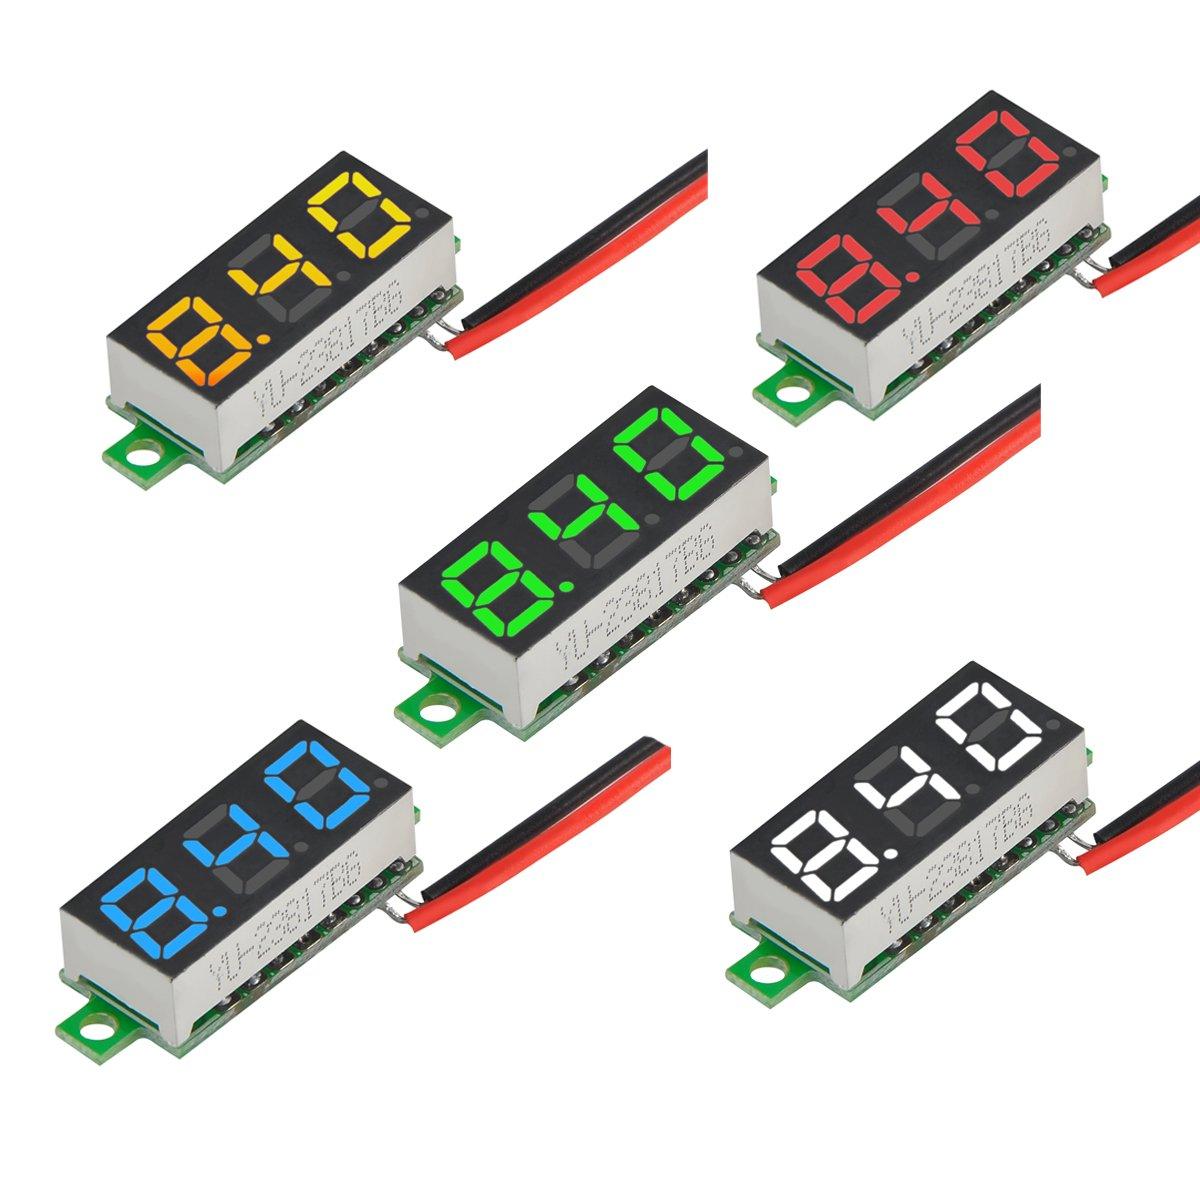 MakerFocus 5pcs Mini Digital DC Voltmeter 0.28 Inch Two-Wire 2.5V-30V Mini Digital DC Voltmeter Voltage Tester Meter 5 Colours by MakerFocus (Image #9)